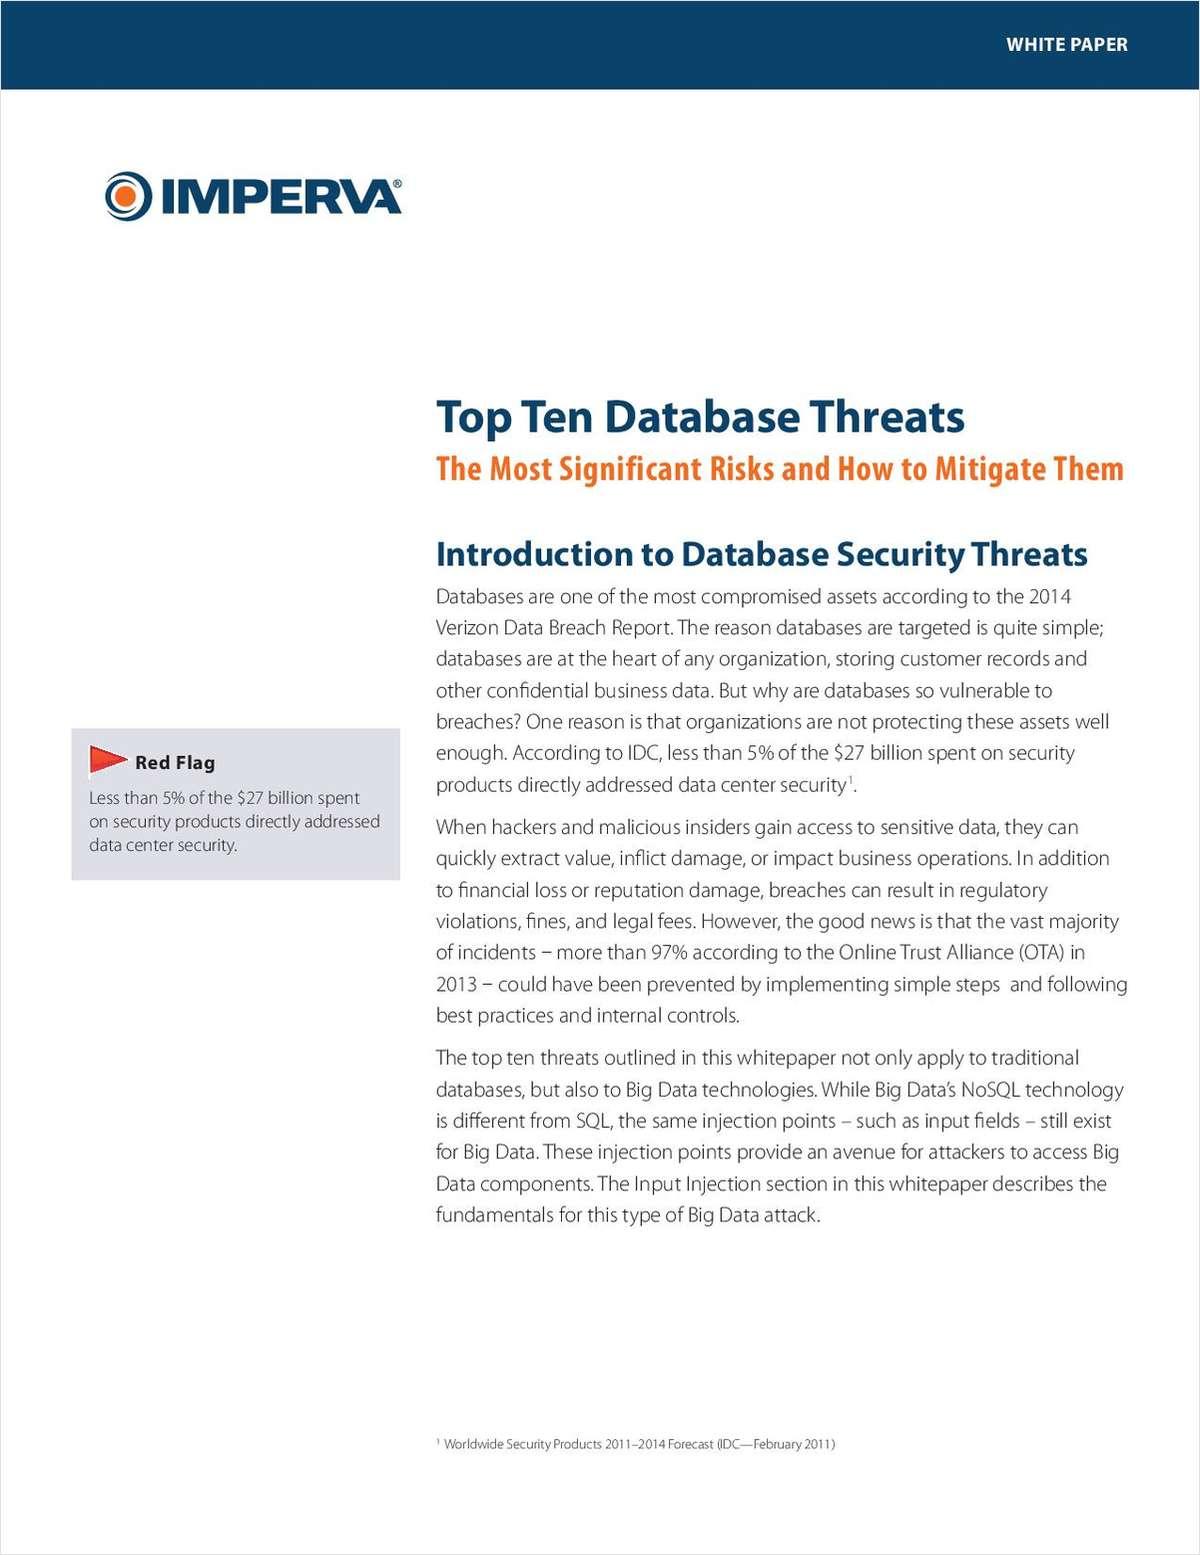 Top 10 Database Threats